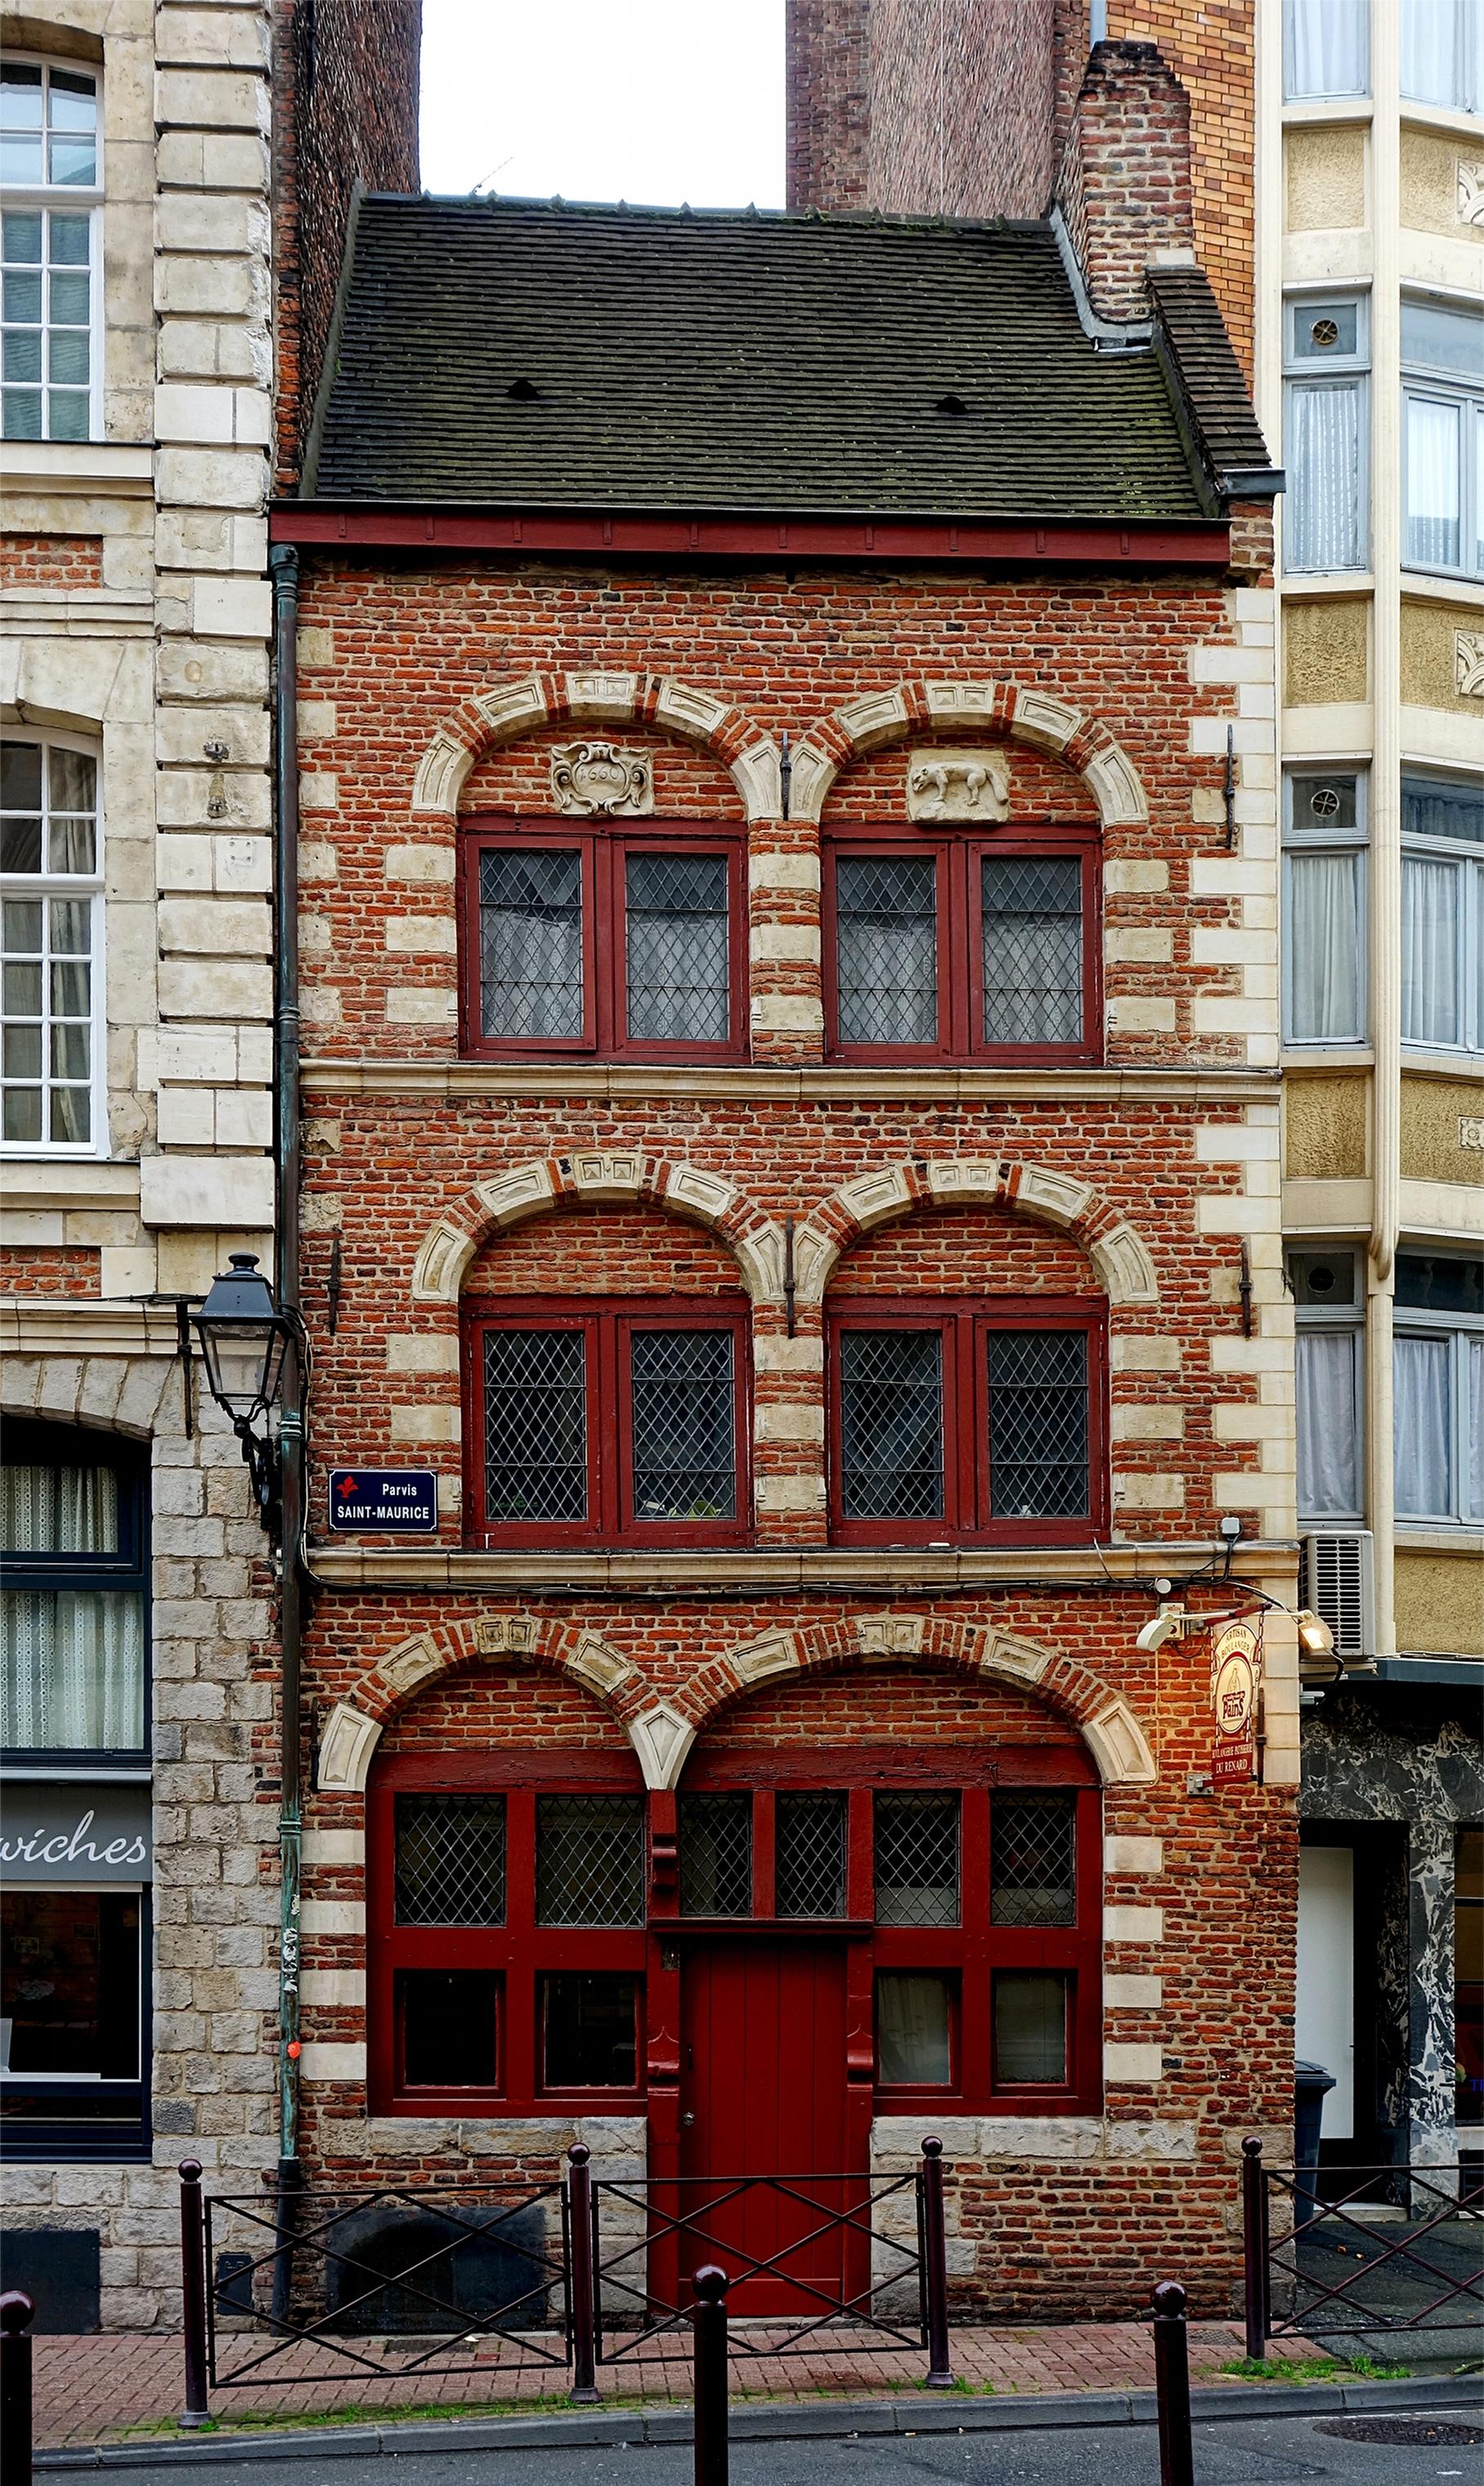 https://upload.wikimedia.org/wikipedia/commons/b/b0/Lille_maison_renard.JPG